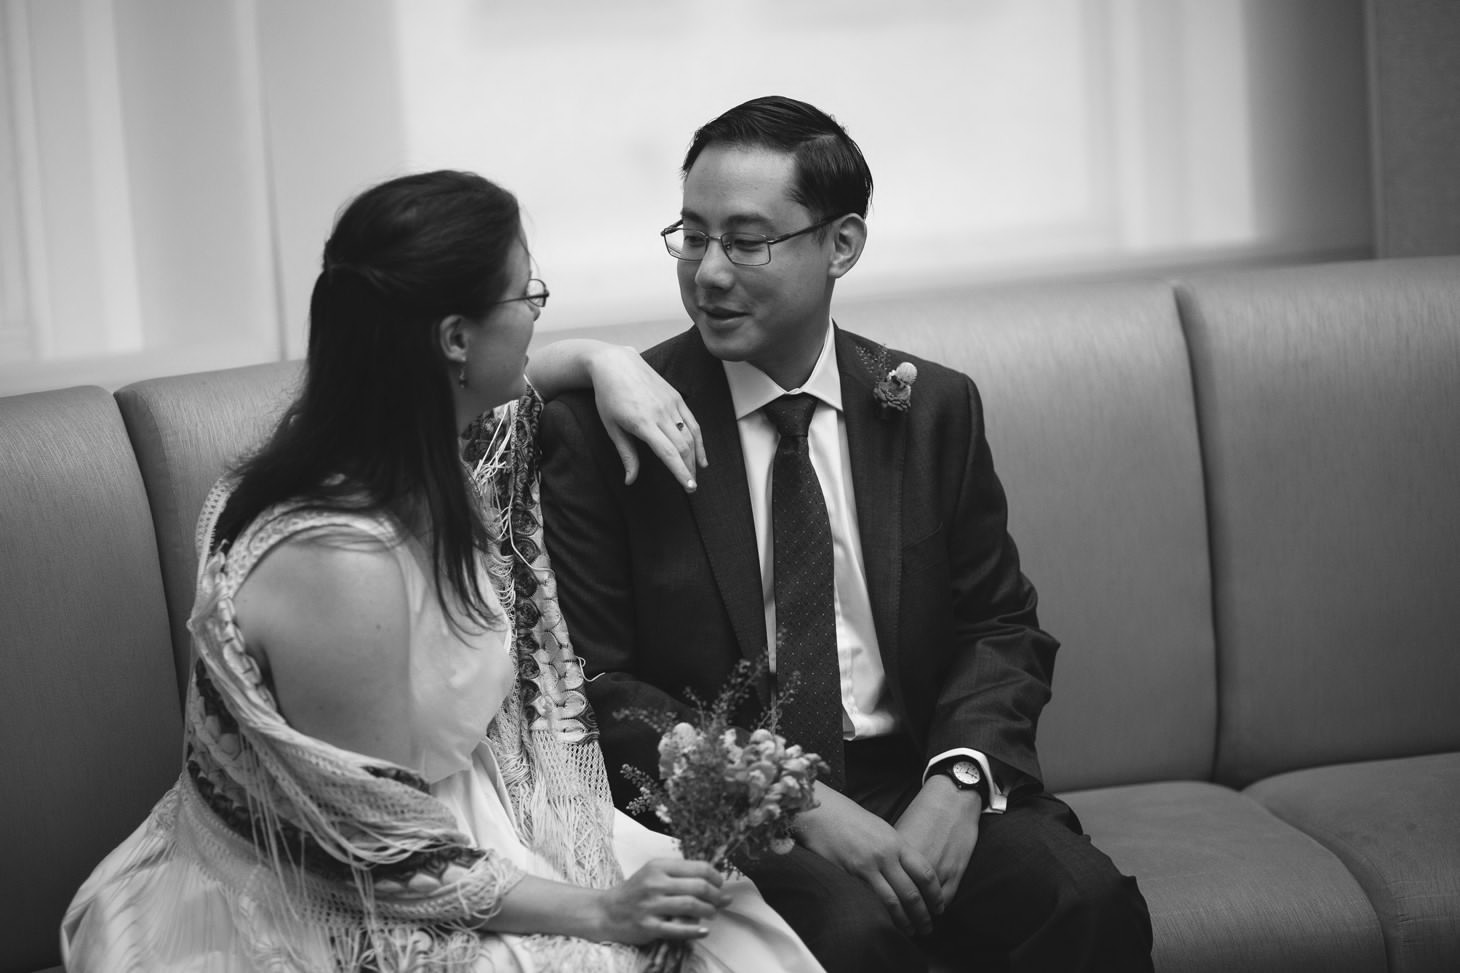 024-nyc-wedding-photographer-smitten-chickens-elope-nyc-city-hall-fall.jpg